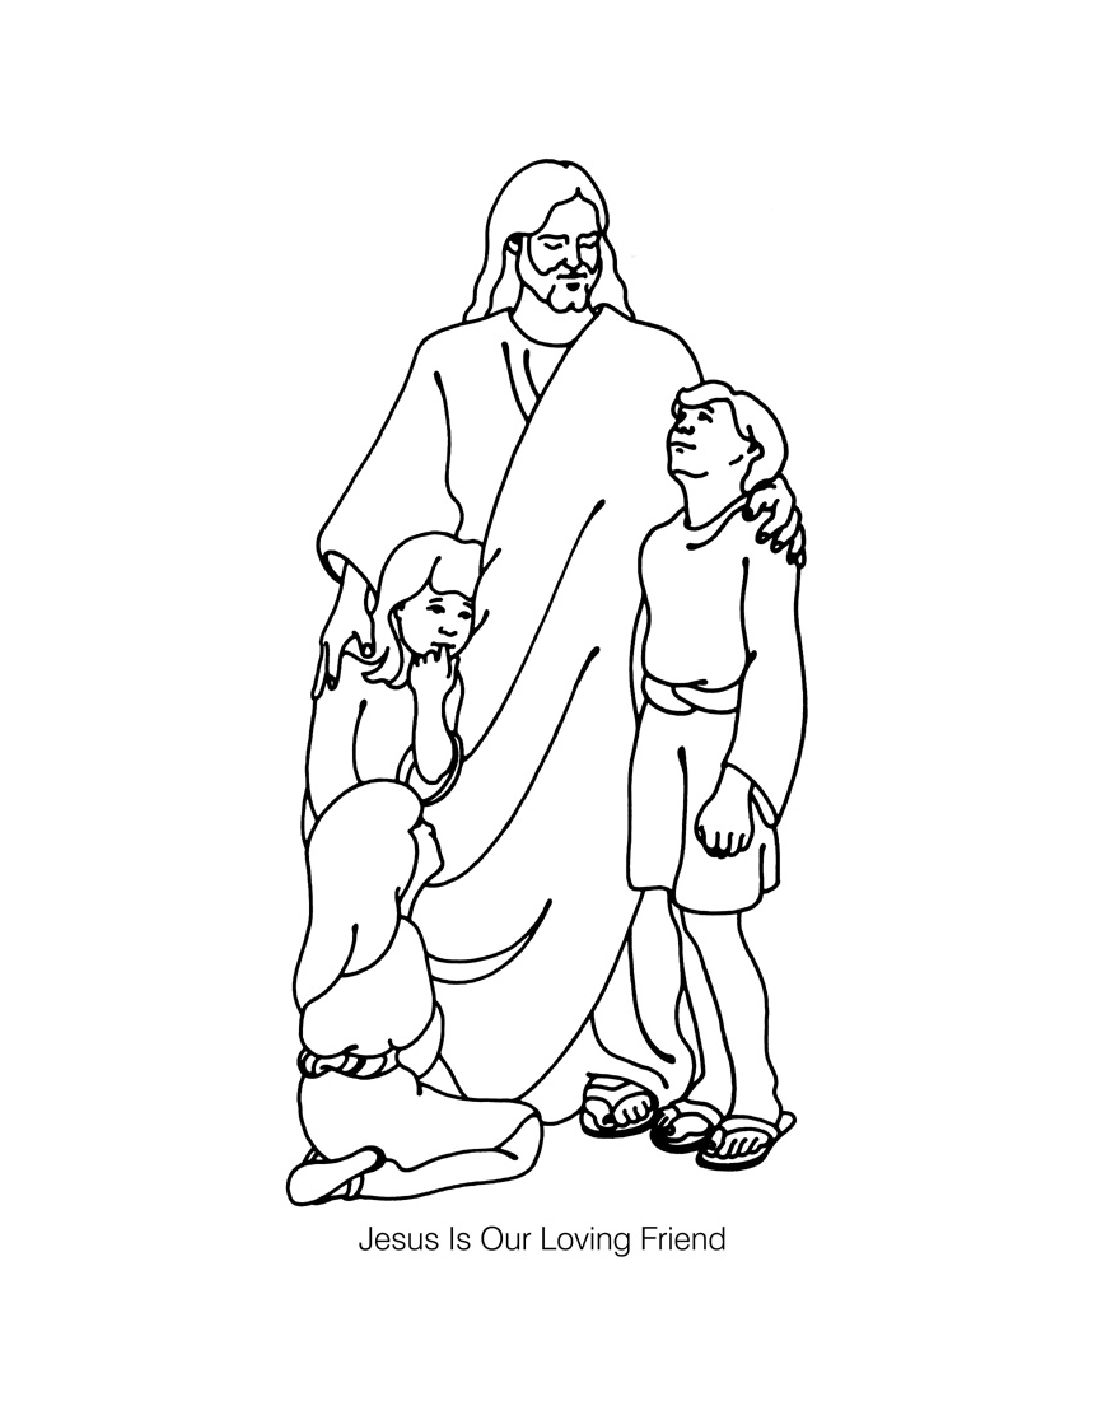 Jesus loves children coloring pages  Jesus coloring pages